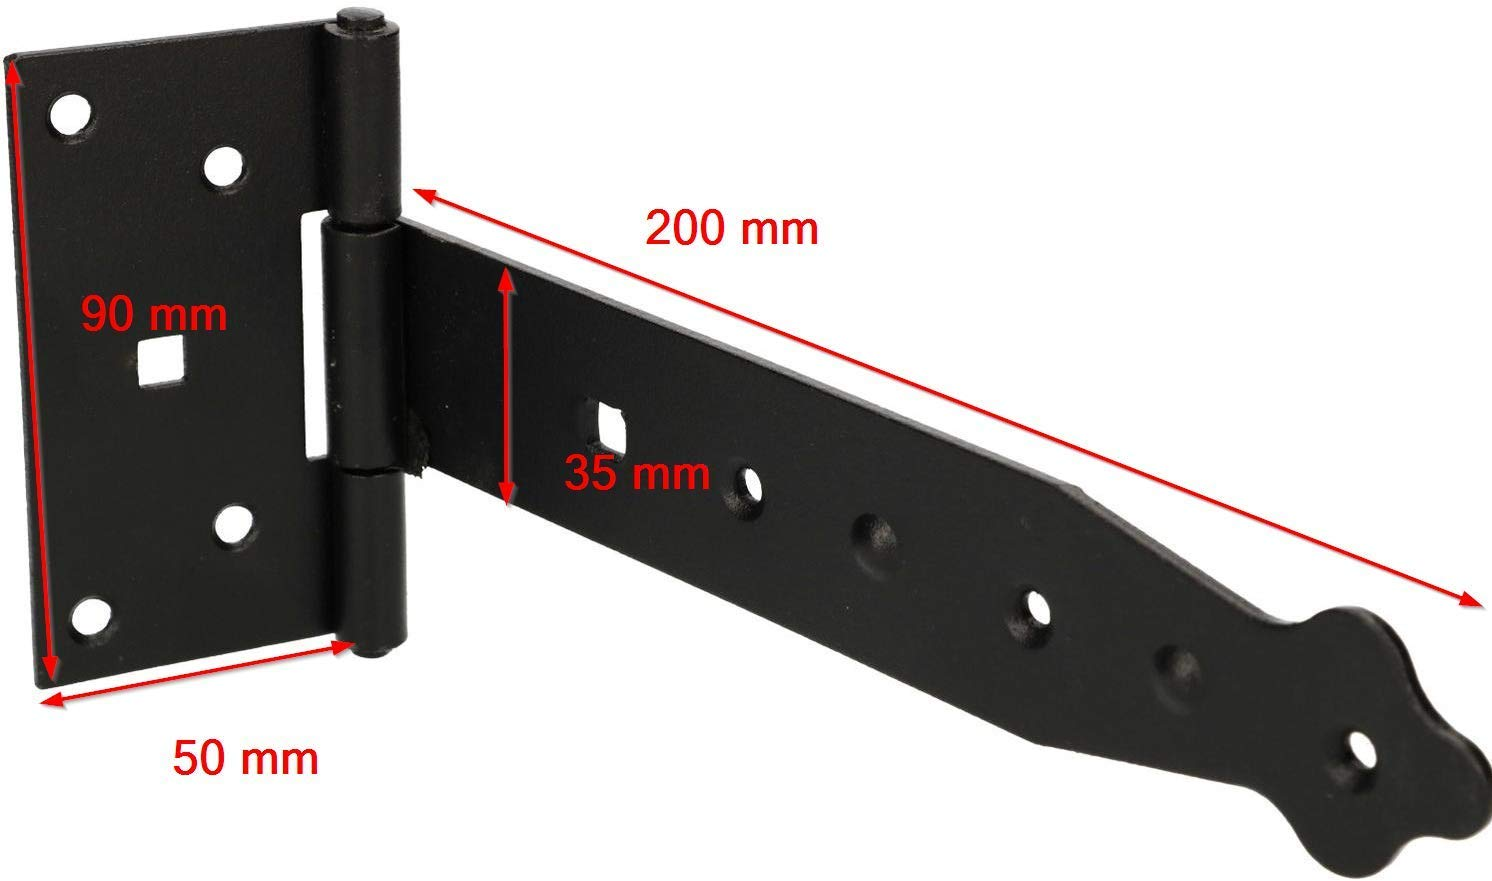 KOTARBAU Werfgeh/änge 250 mm T/ürband Torscharnier Pulverbeschichtet Ladenband Kreuzgeh/änge T/ürscharnier Band Scharnier Schwarz Rostfrei Top